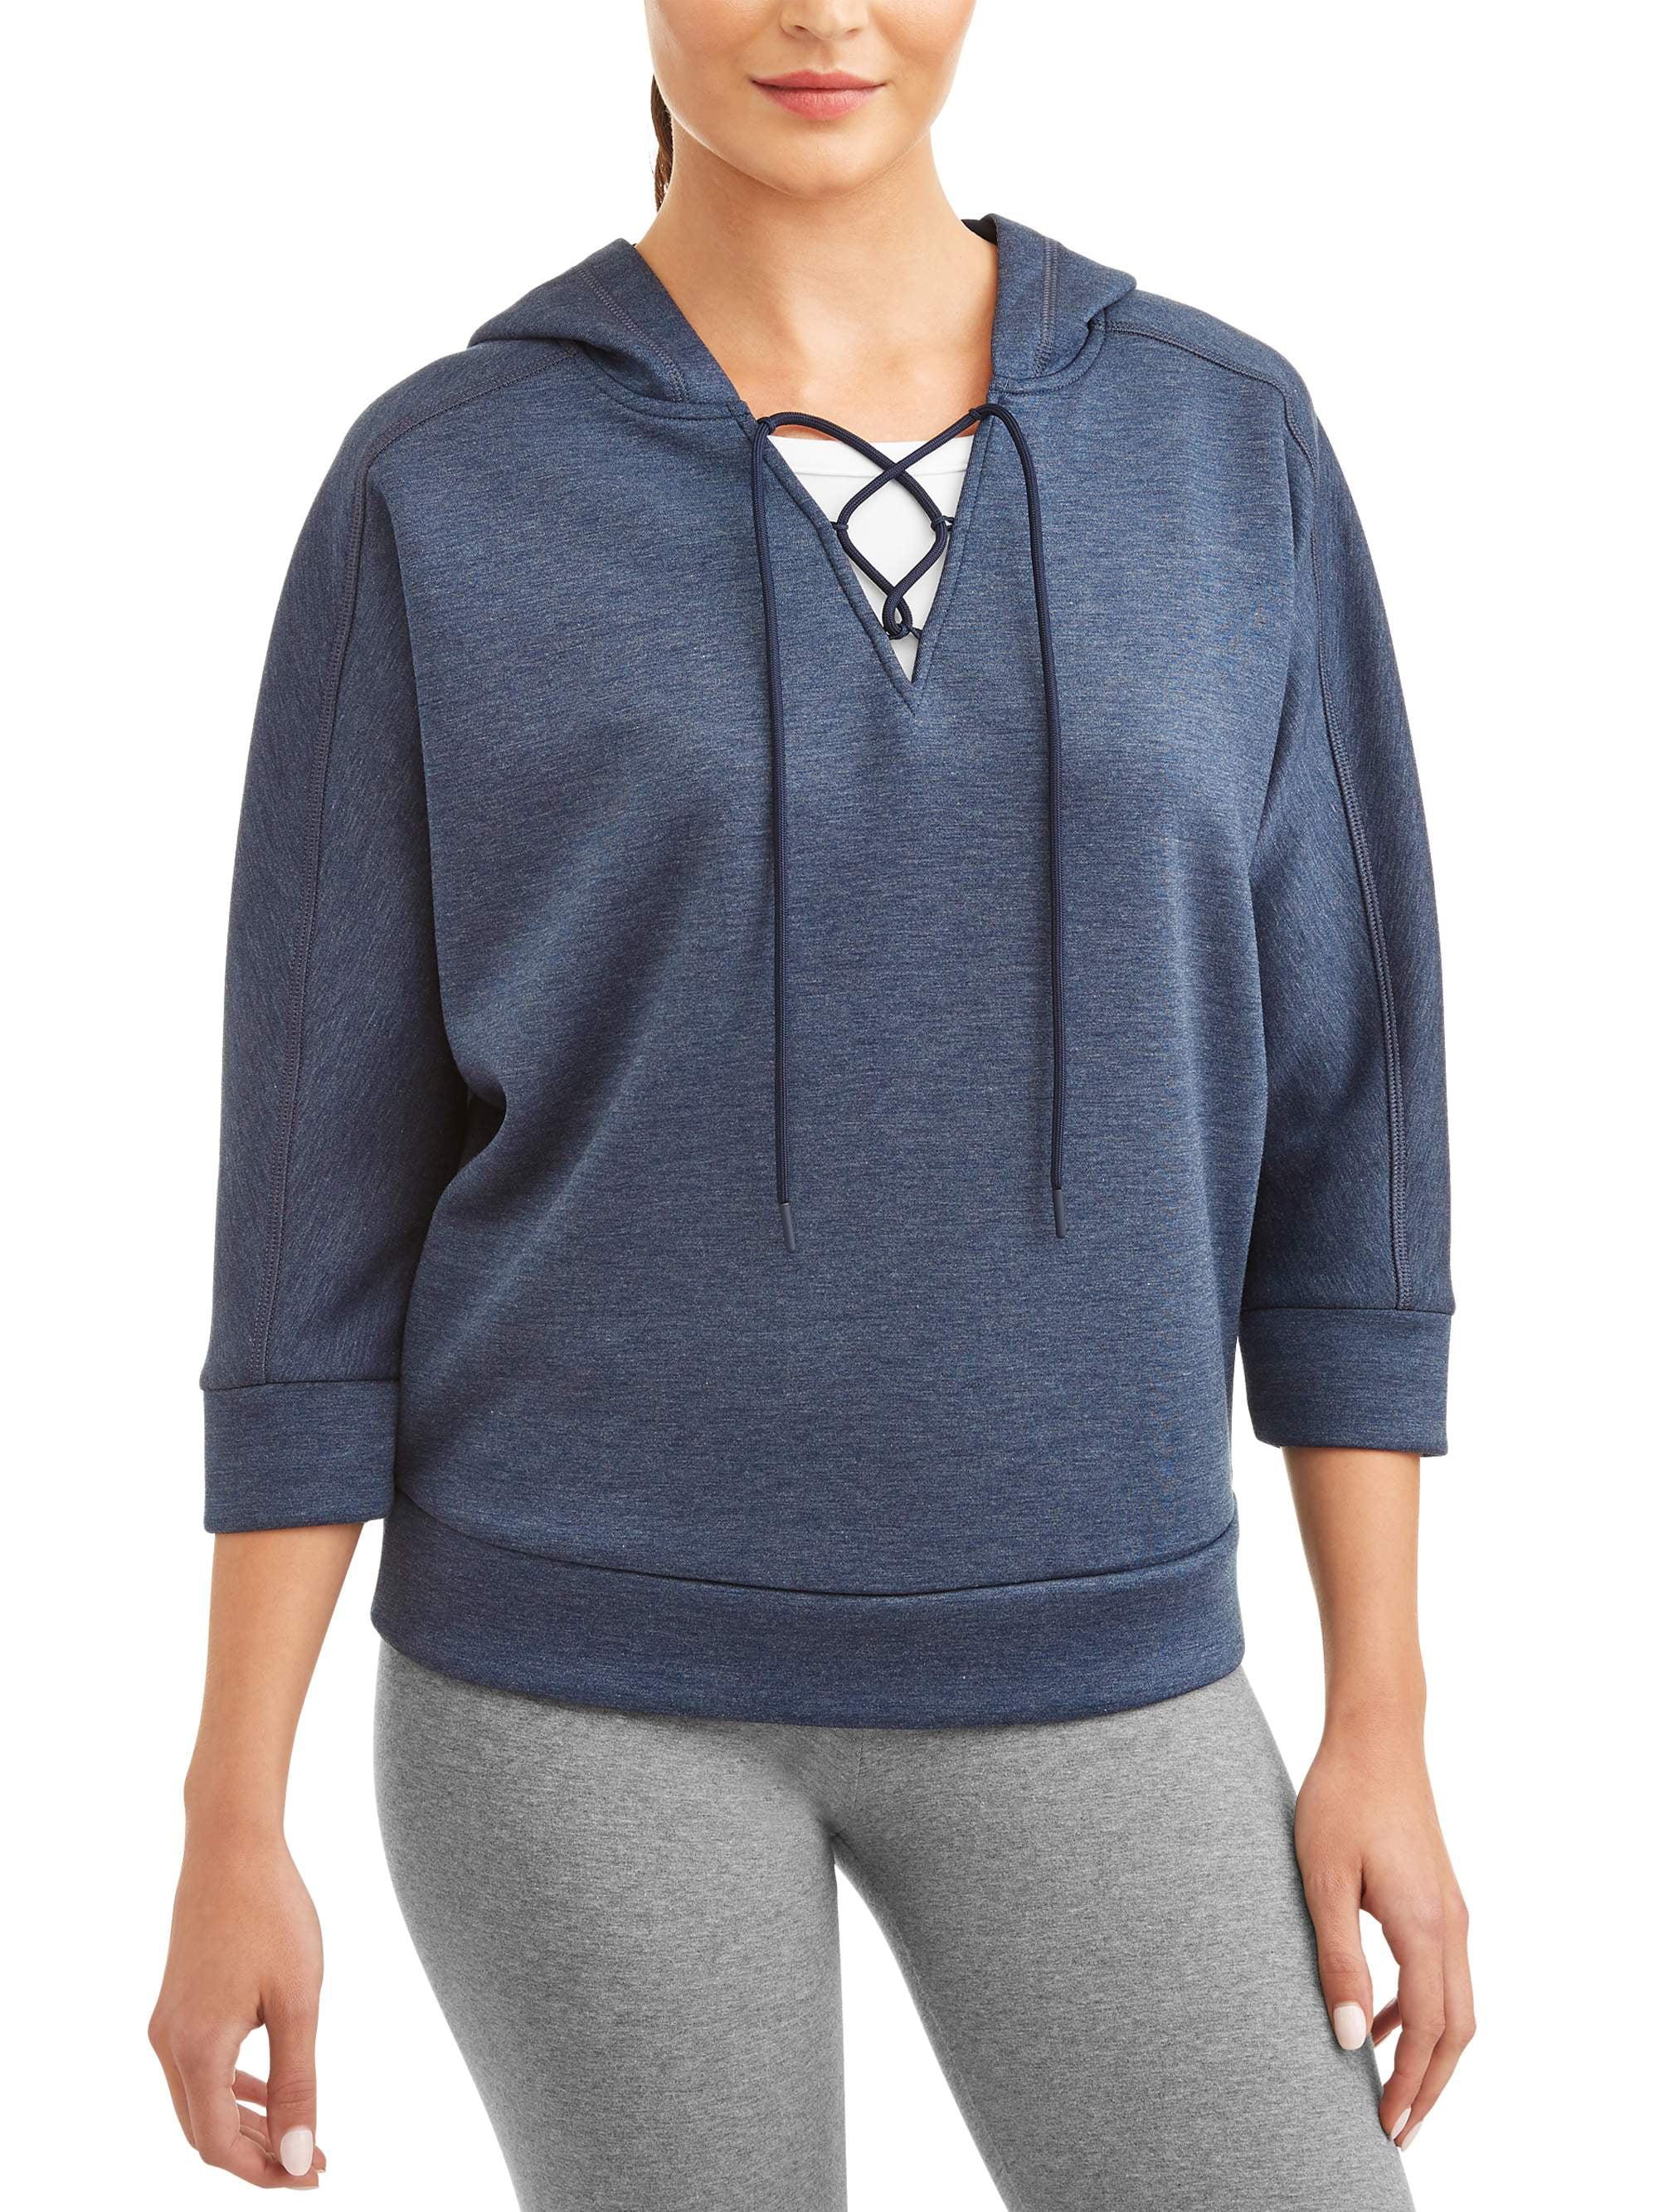 Avia Women's Athleisure Lace Up Lightweight Hoodie Sweatshirt